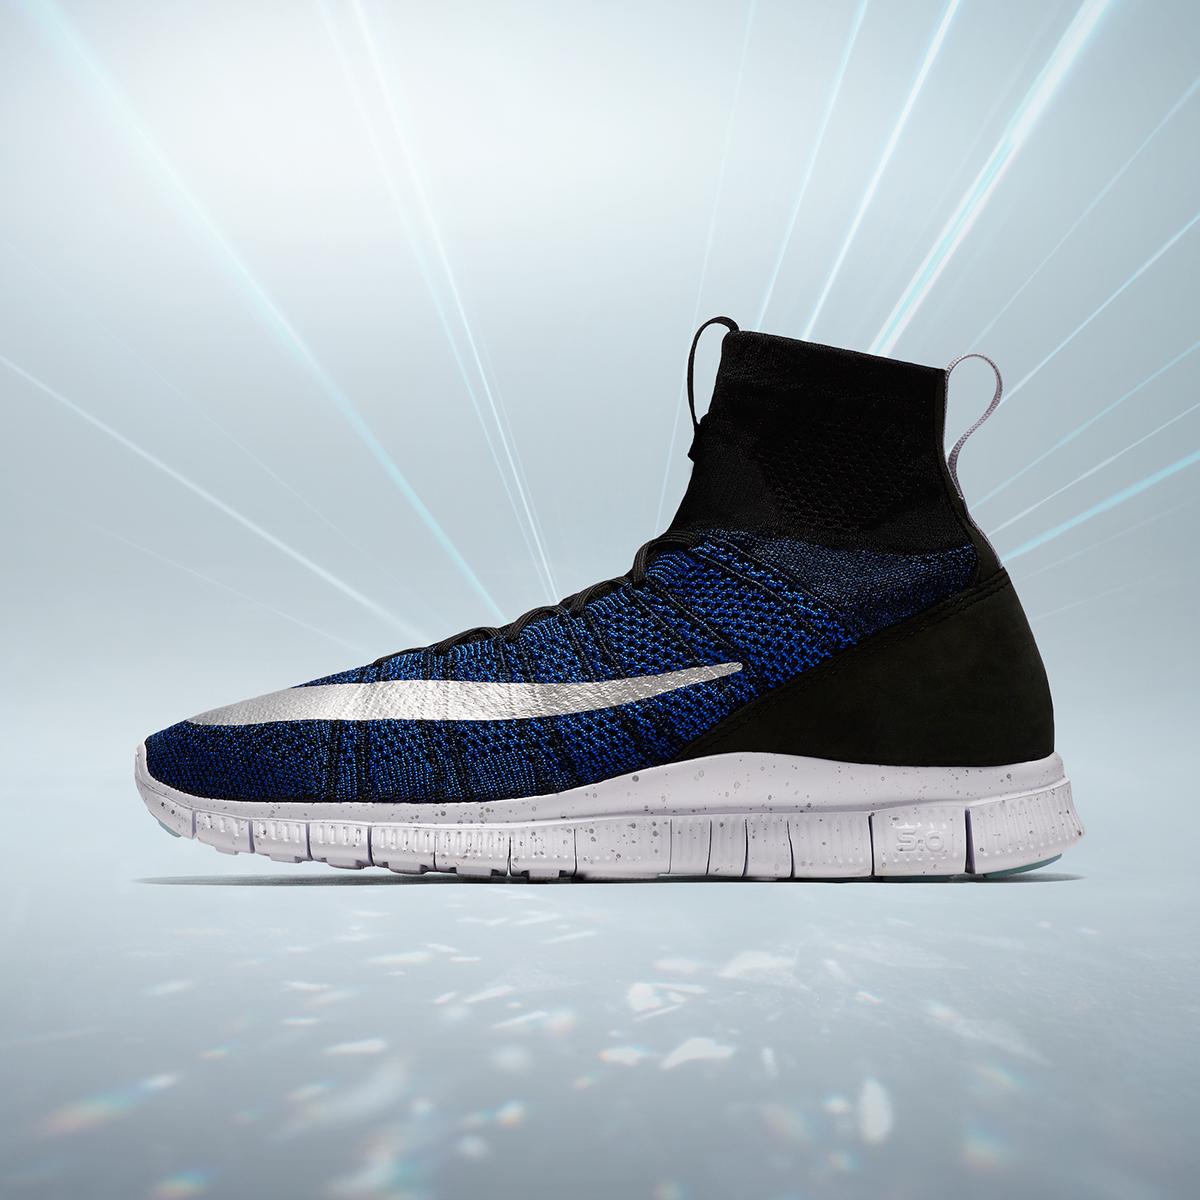 Nike Mercurial Da Passeggio